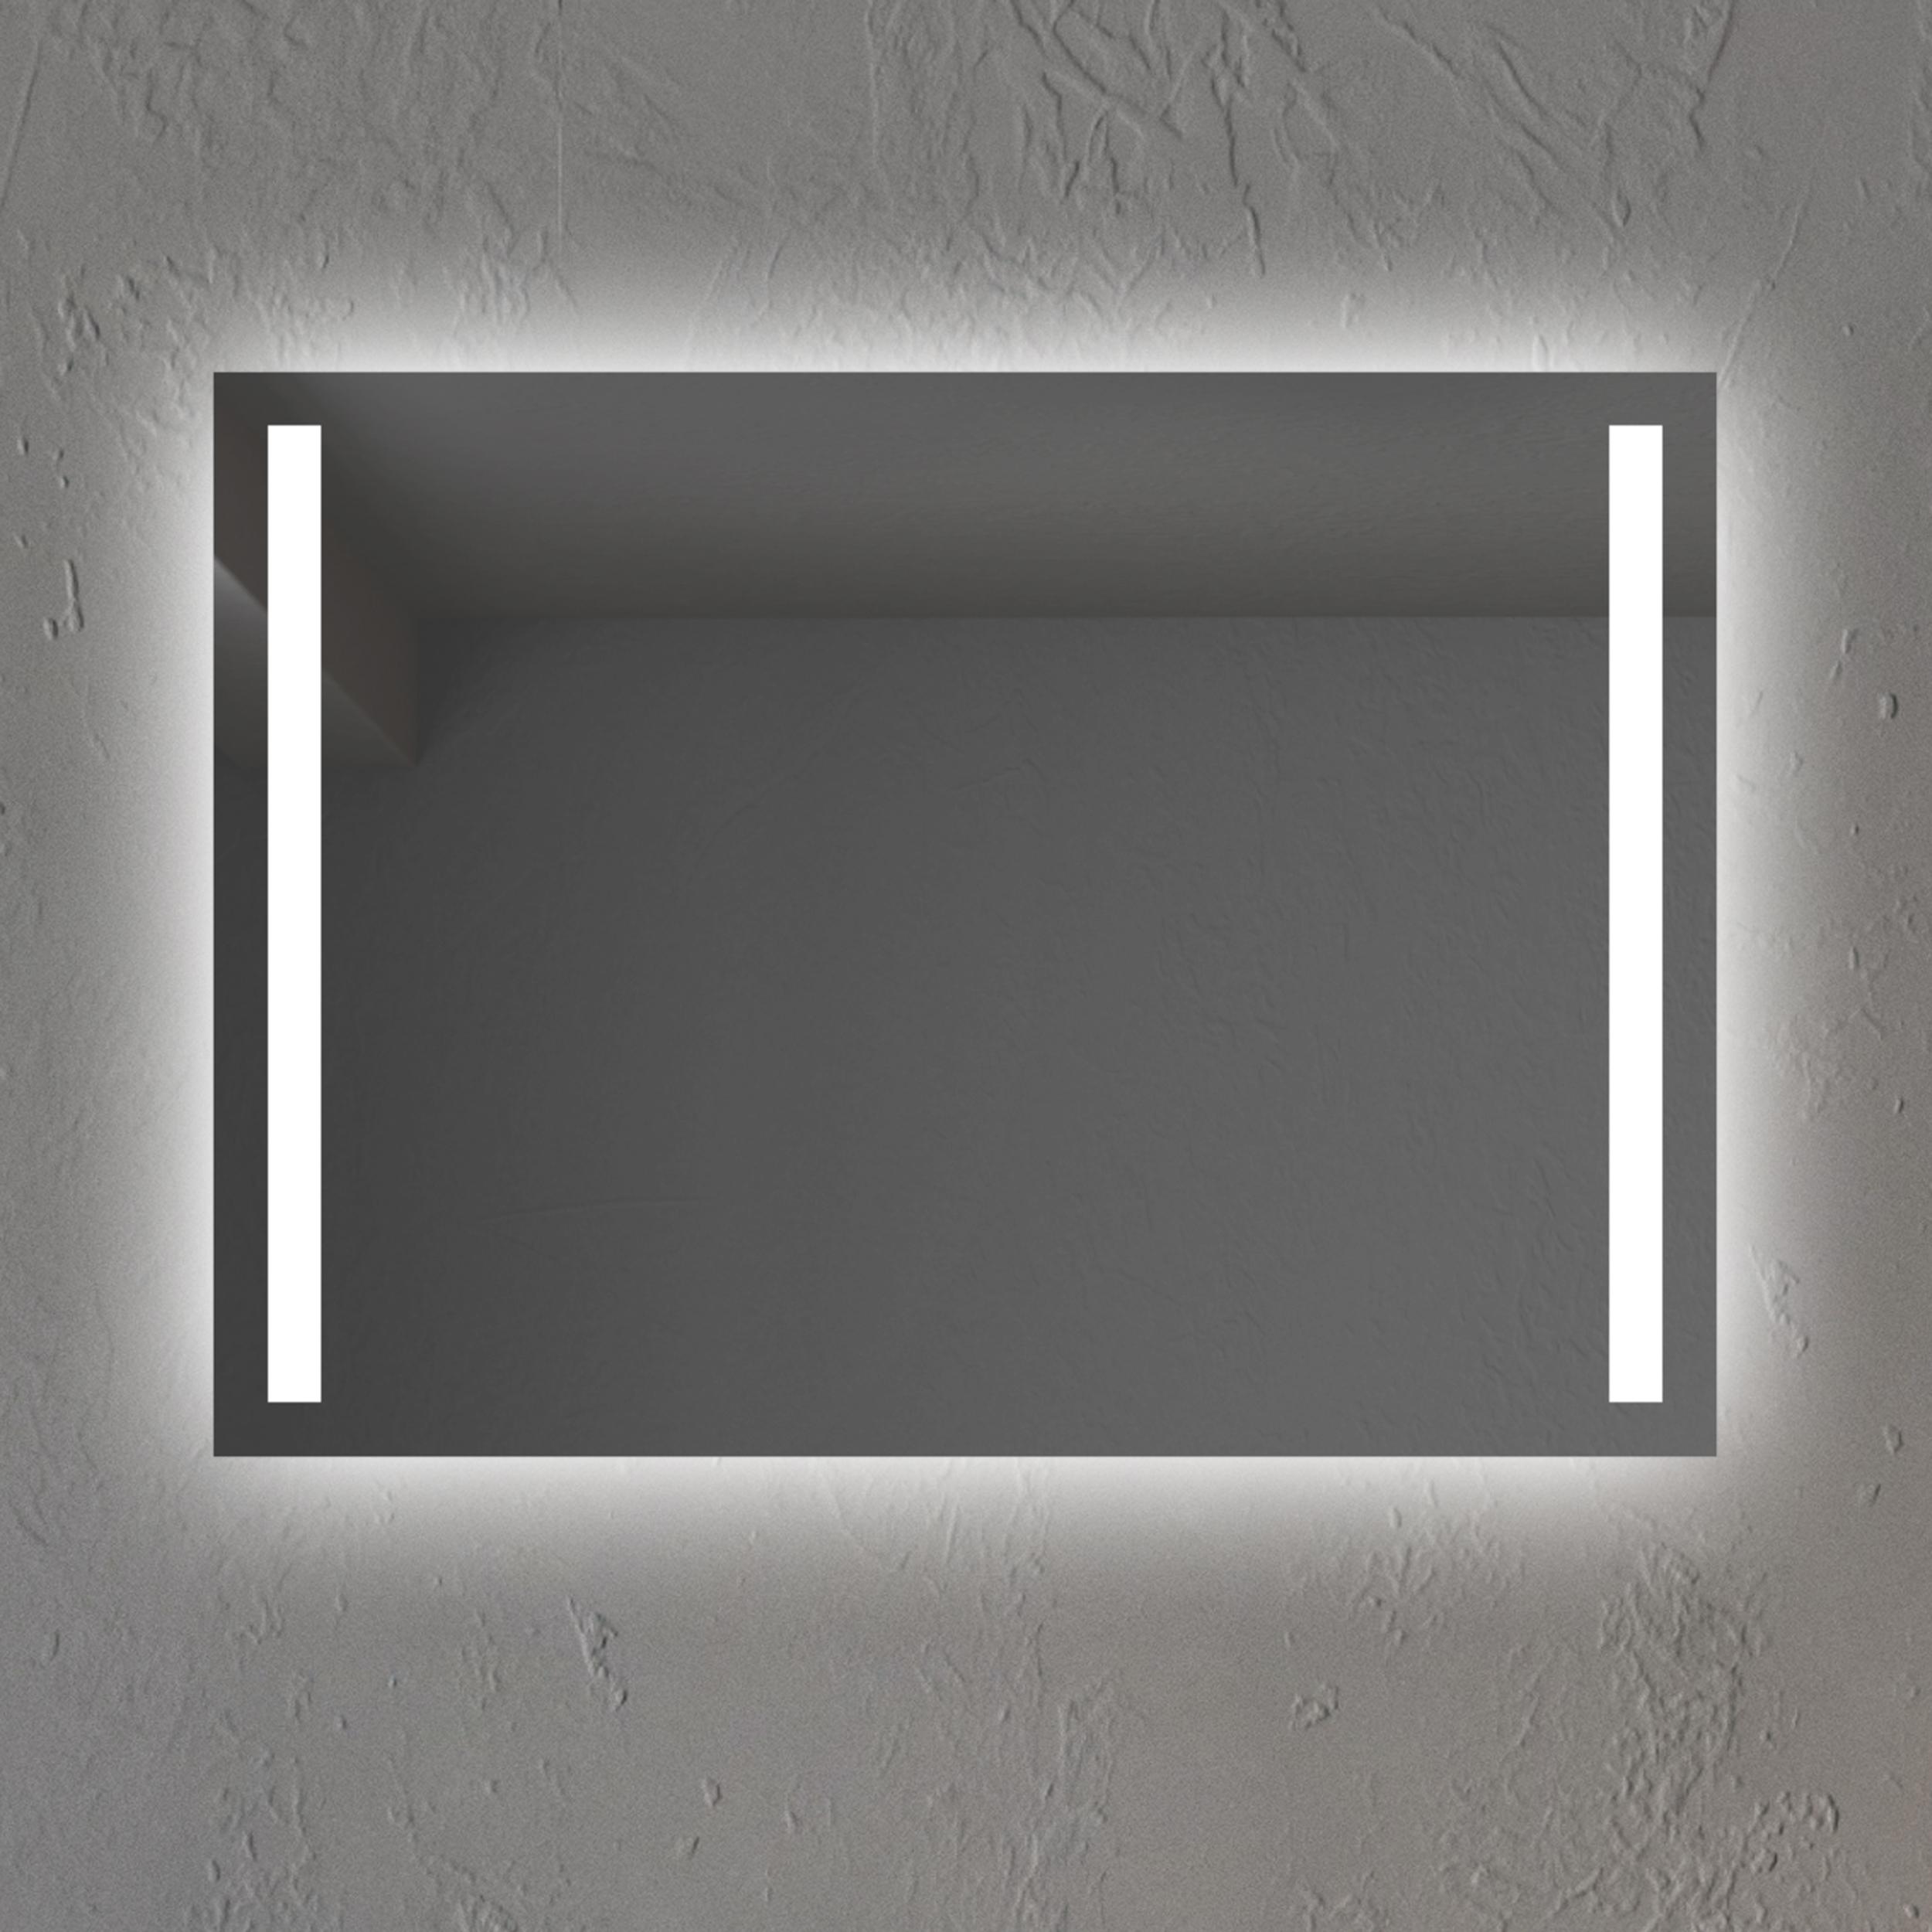 Badspiegel mit LED Beleuchtung LED Spiegel Beleuchtet Wandspiegel  Lichtspiegel Badezimmerspiegel 50 x 70 cm Modell 667475 INVIDIA